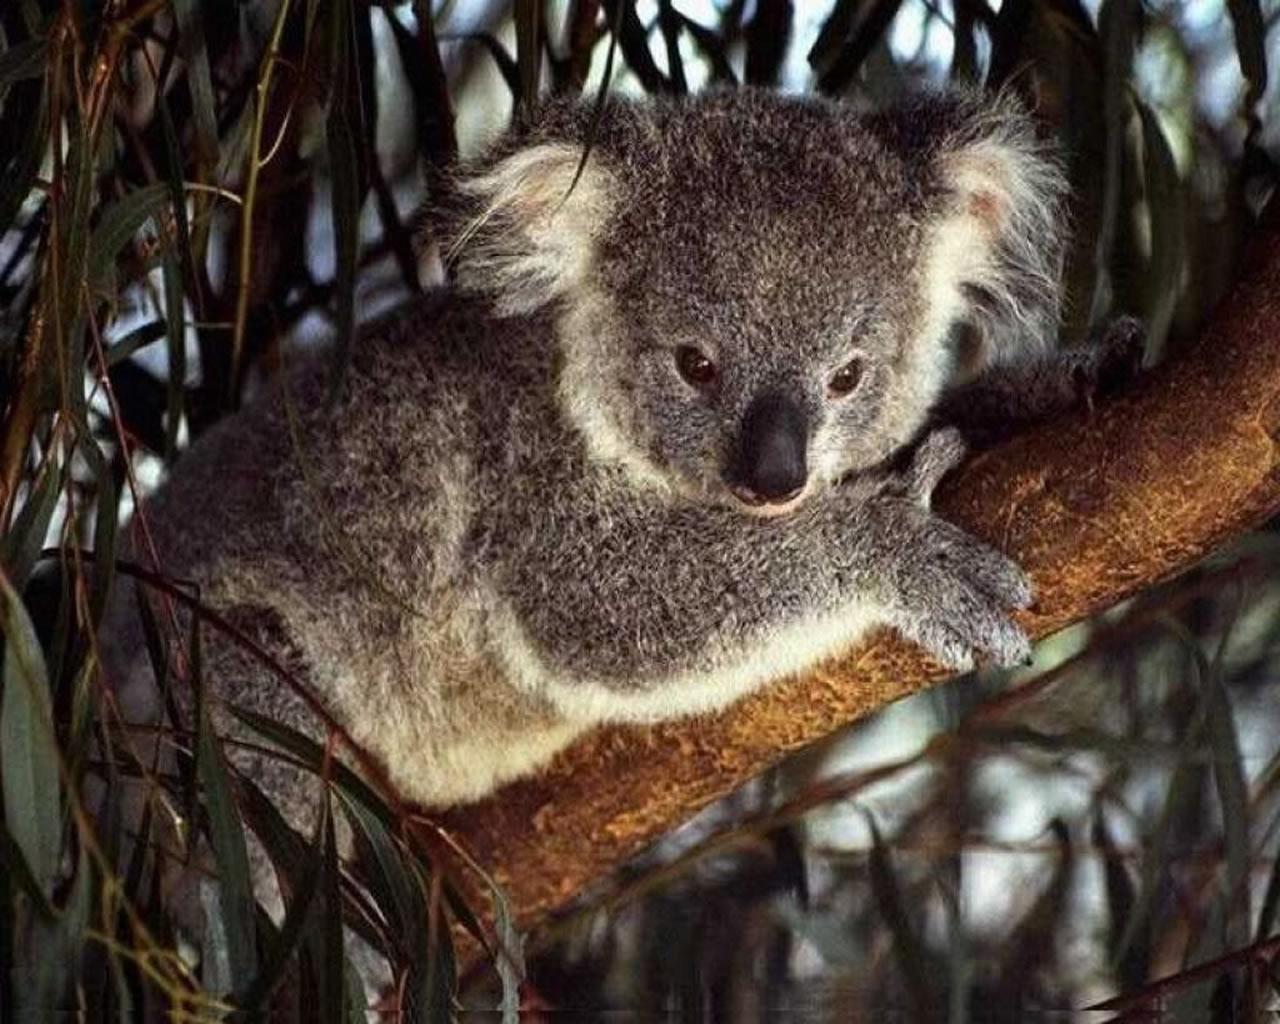 download wallpaper: koalabeertje wallpaper